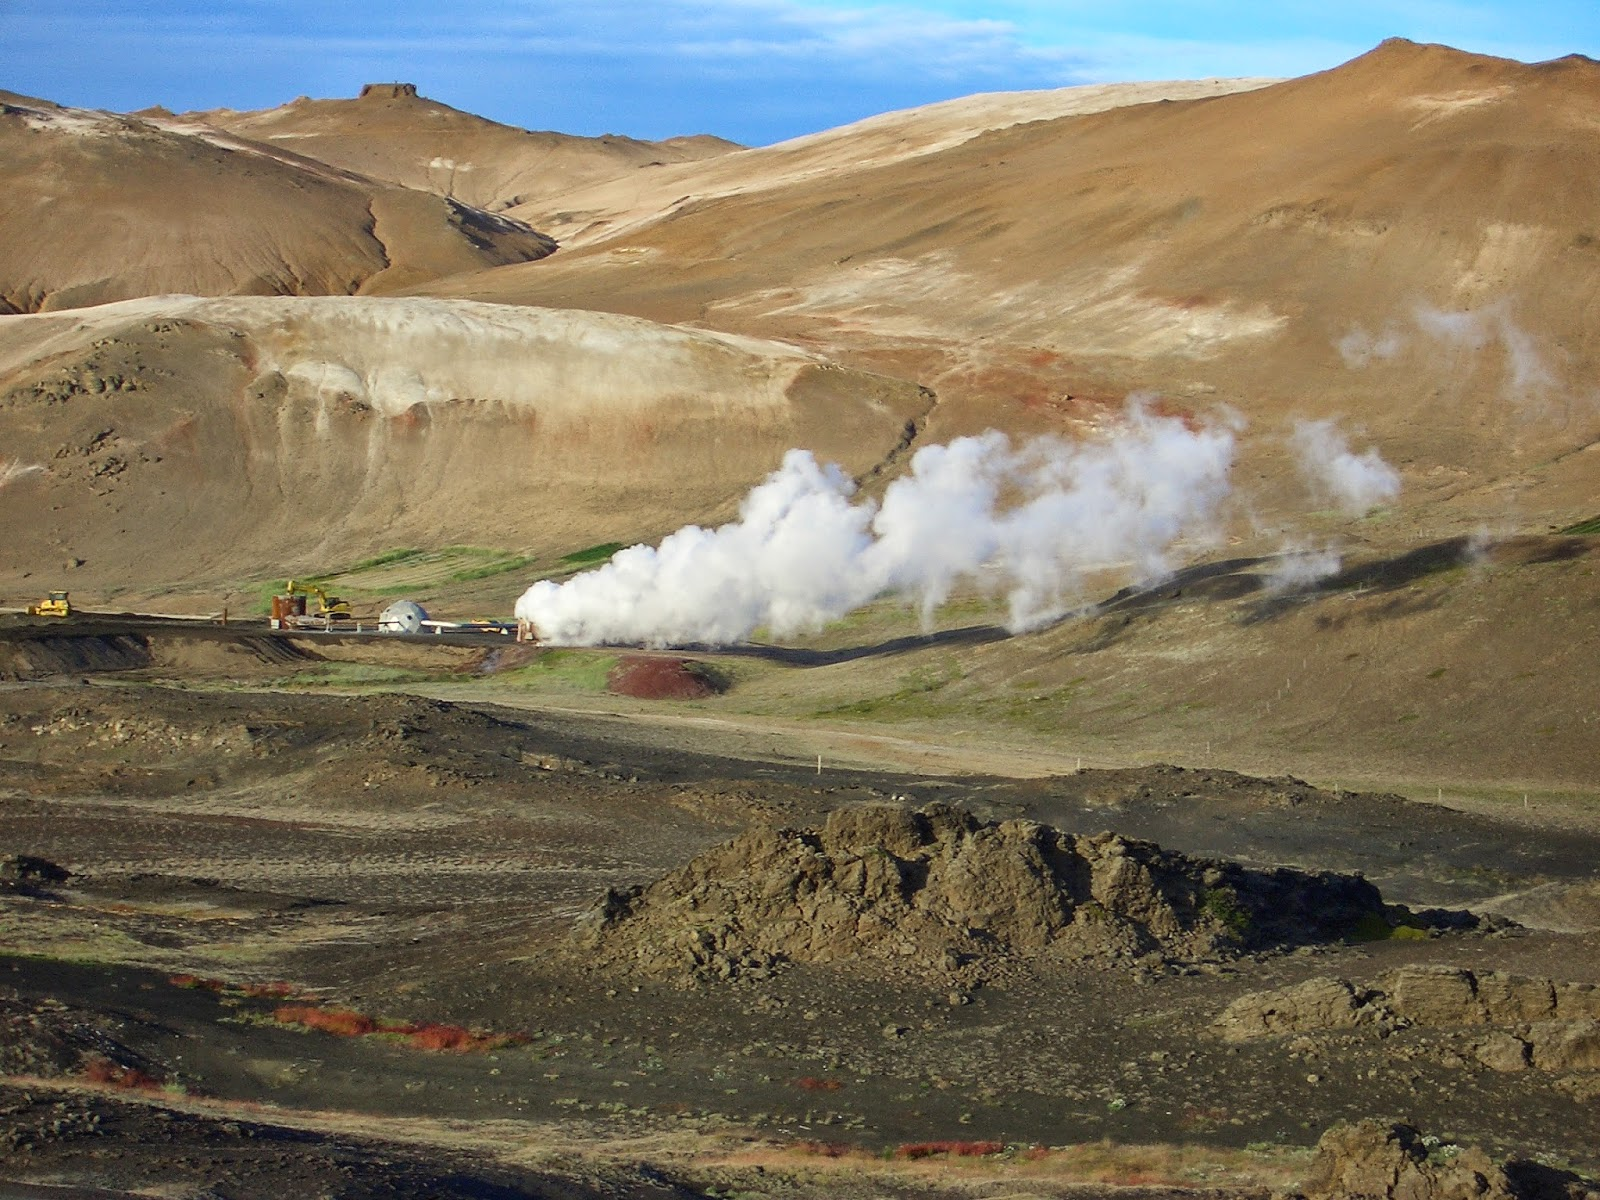 Reykjahlid, estacion geotermica